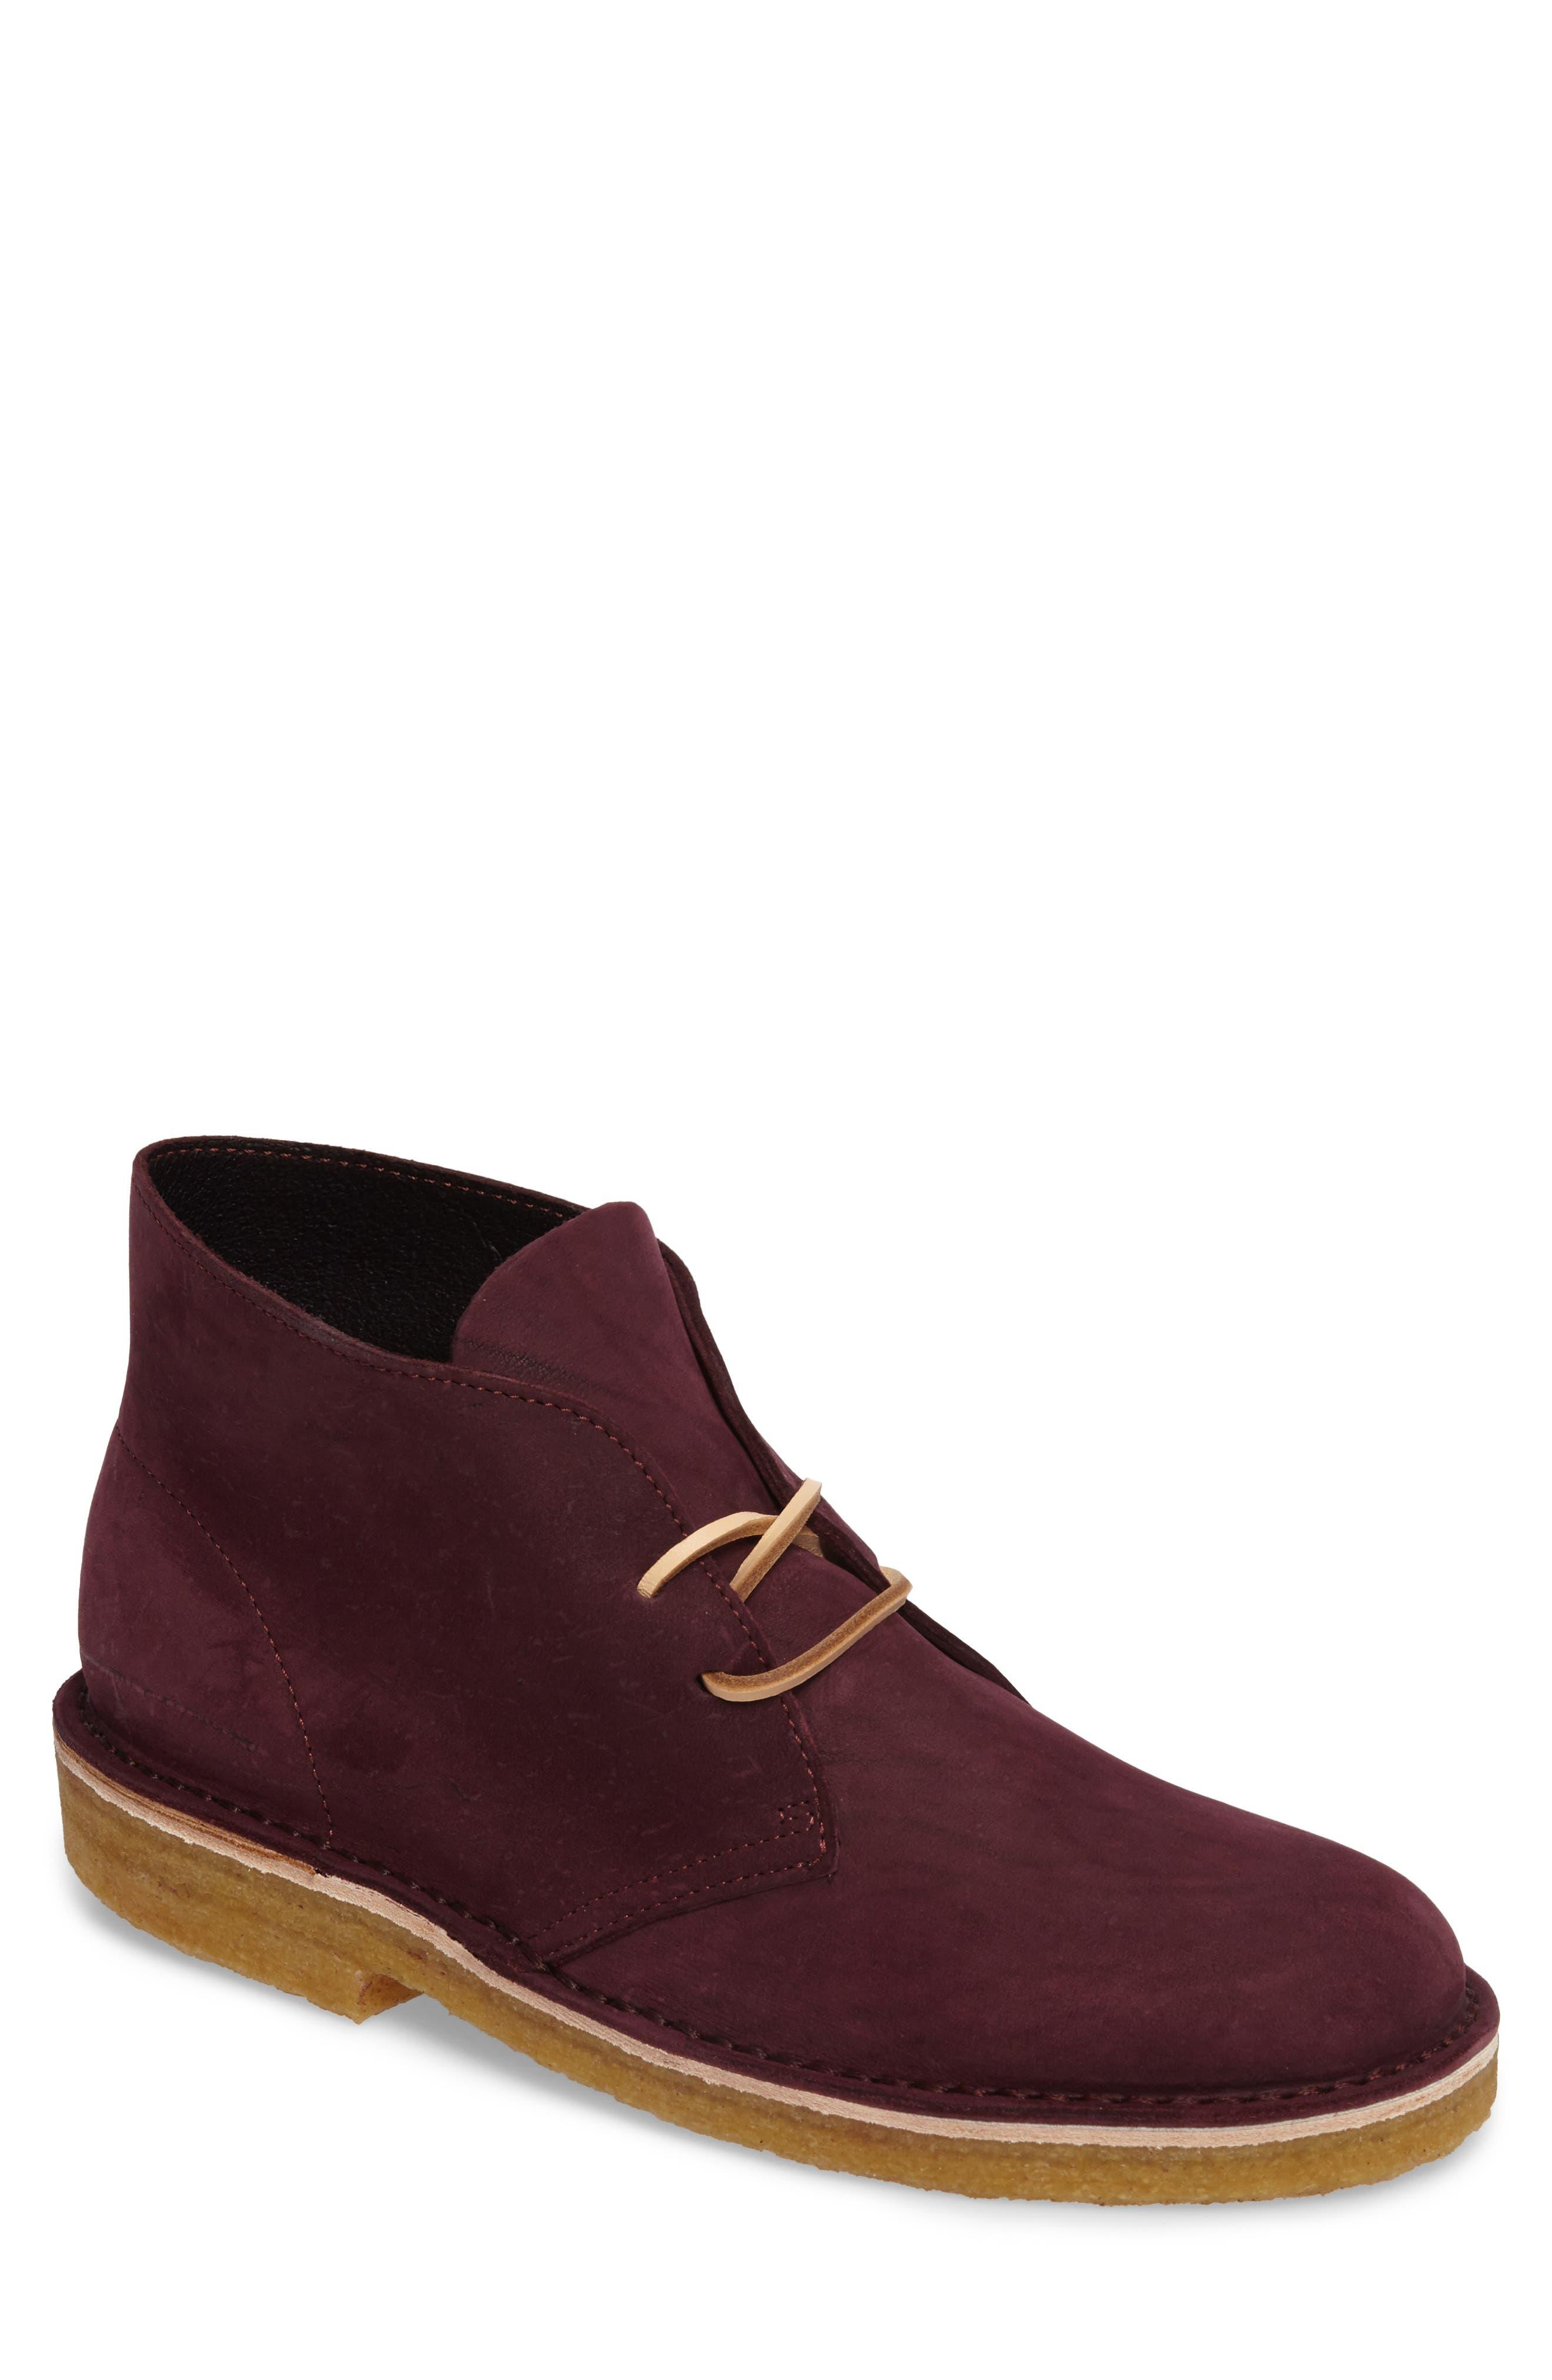 Clarks Desert Chukka Boot,                         Main,                         color, Burgundy Nubuck